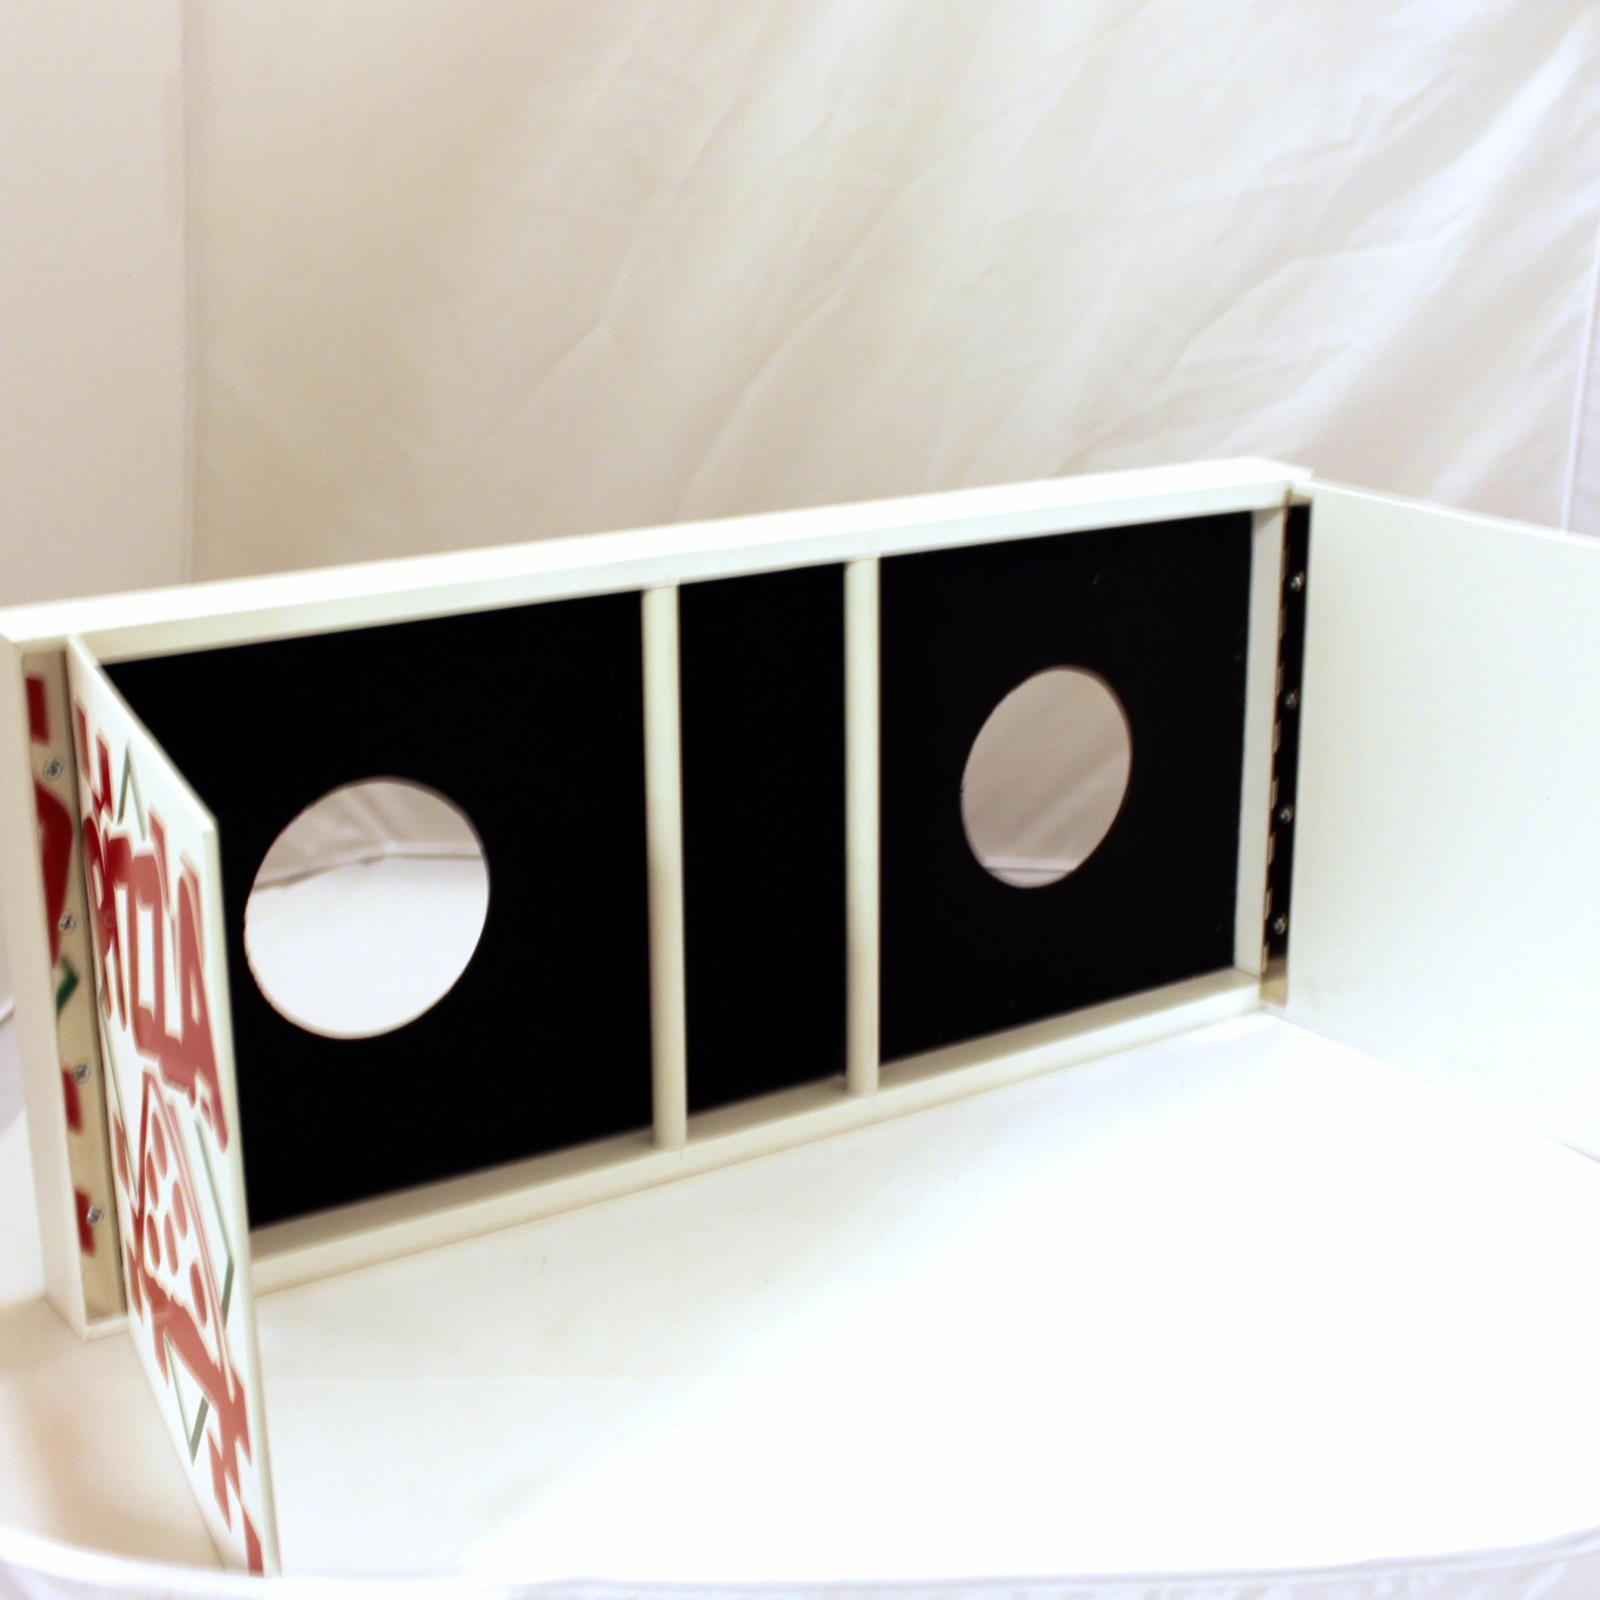 Magic Pizza Box by Smoky Mountain Magic